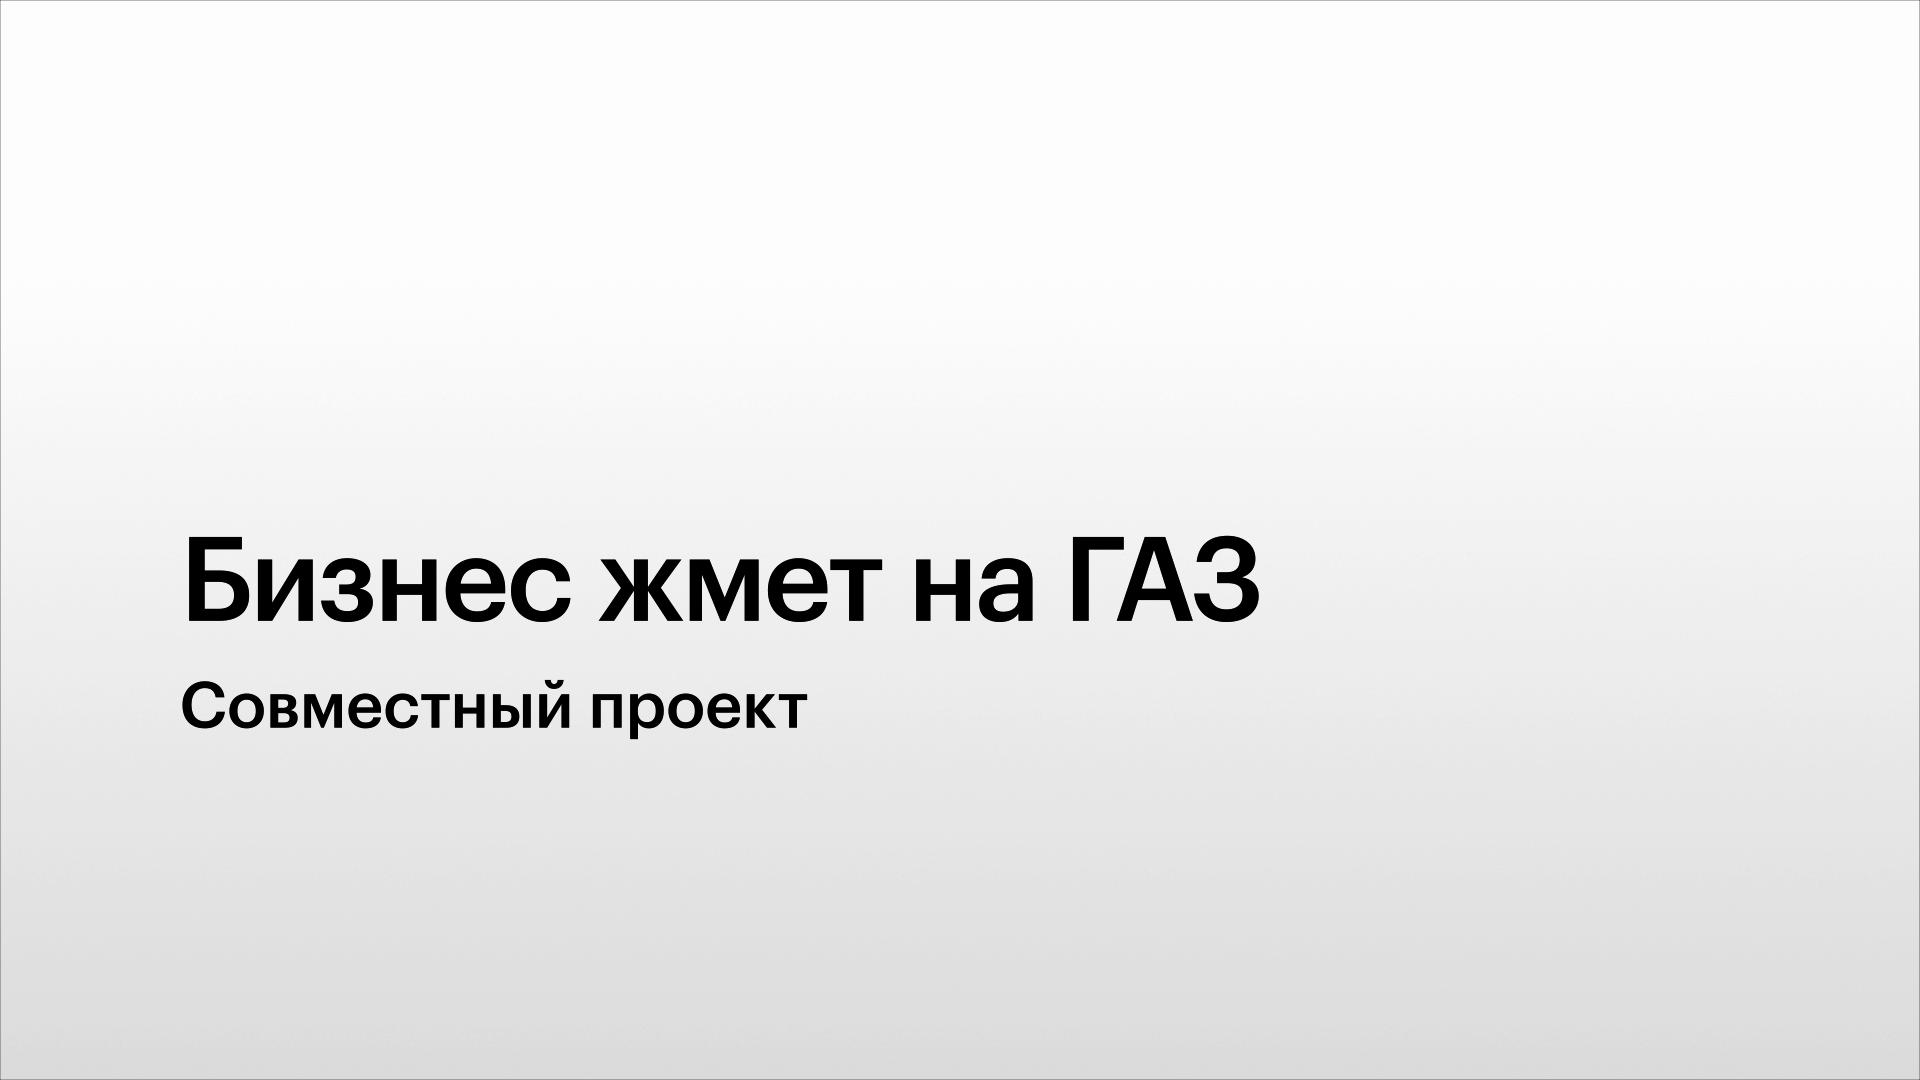 Programme: Совместный проект / Бизнес жмёт на ГАЗ